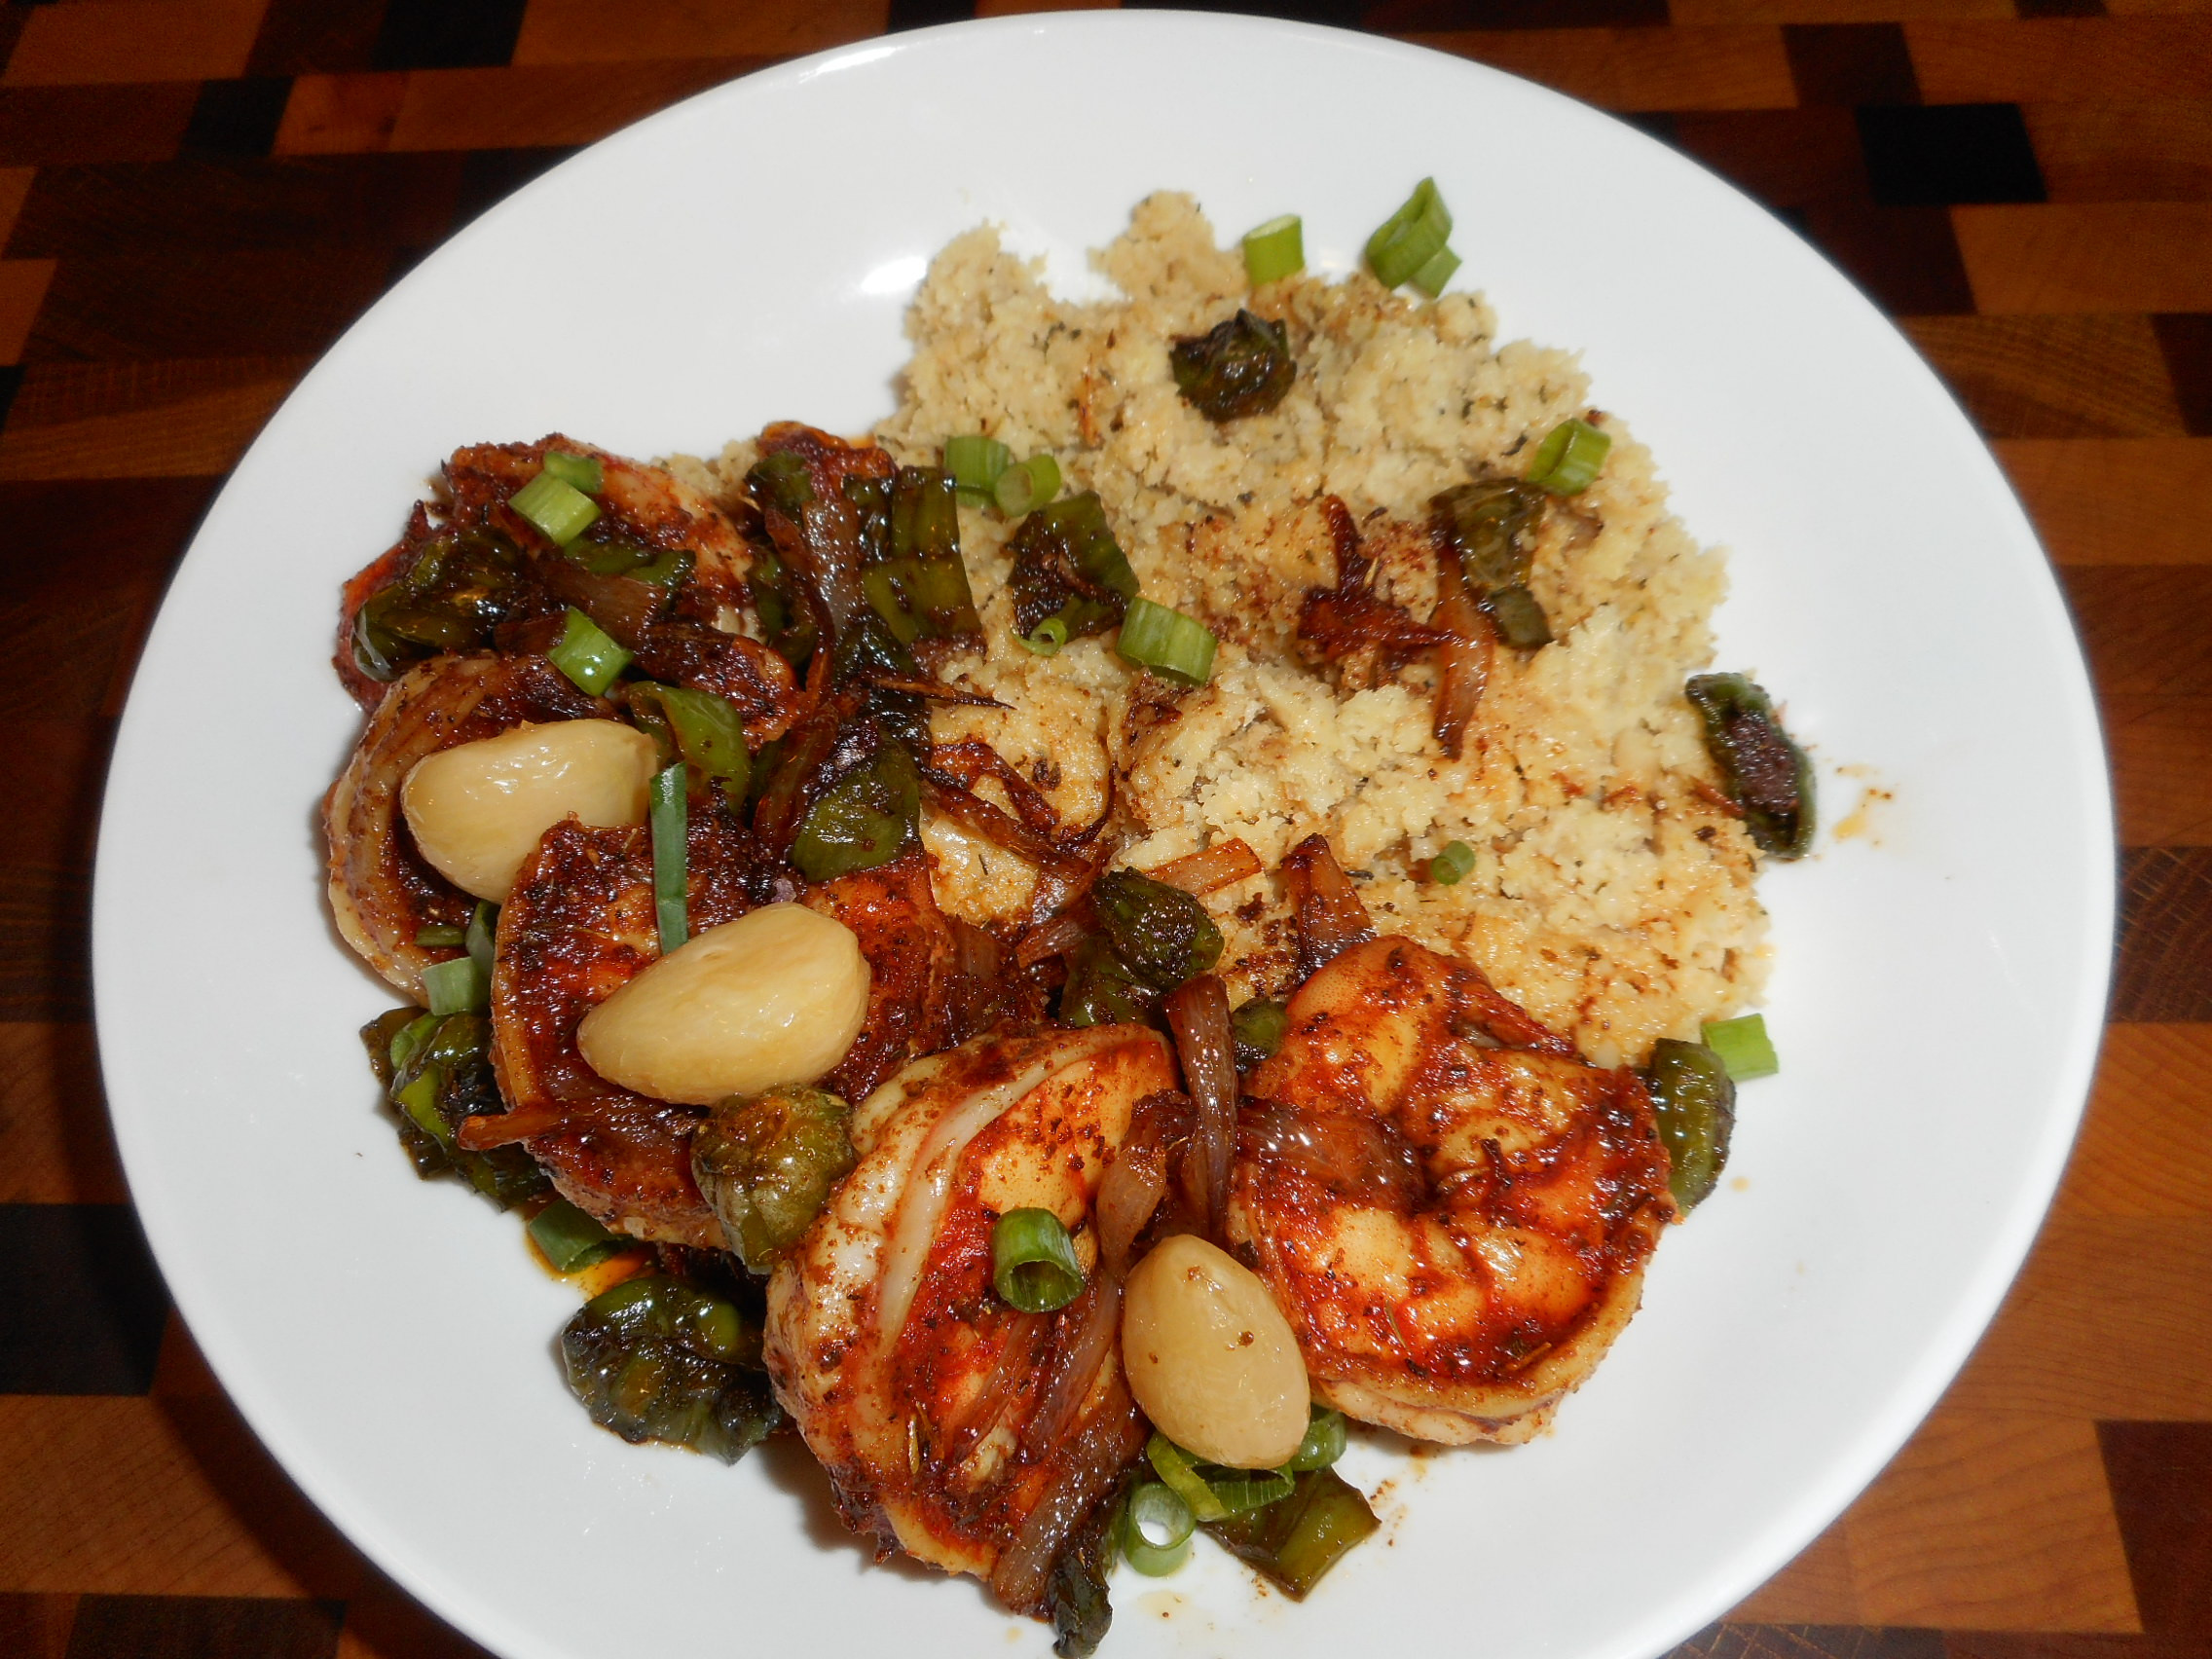 Cajun Shrimp Keto  Keto Cajun Shrimp Peppers & Grits LowCarb Diabetic Chef s